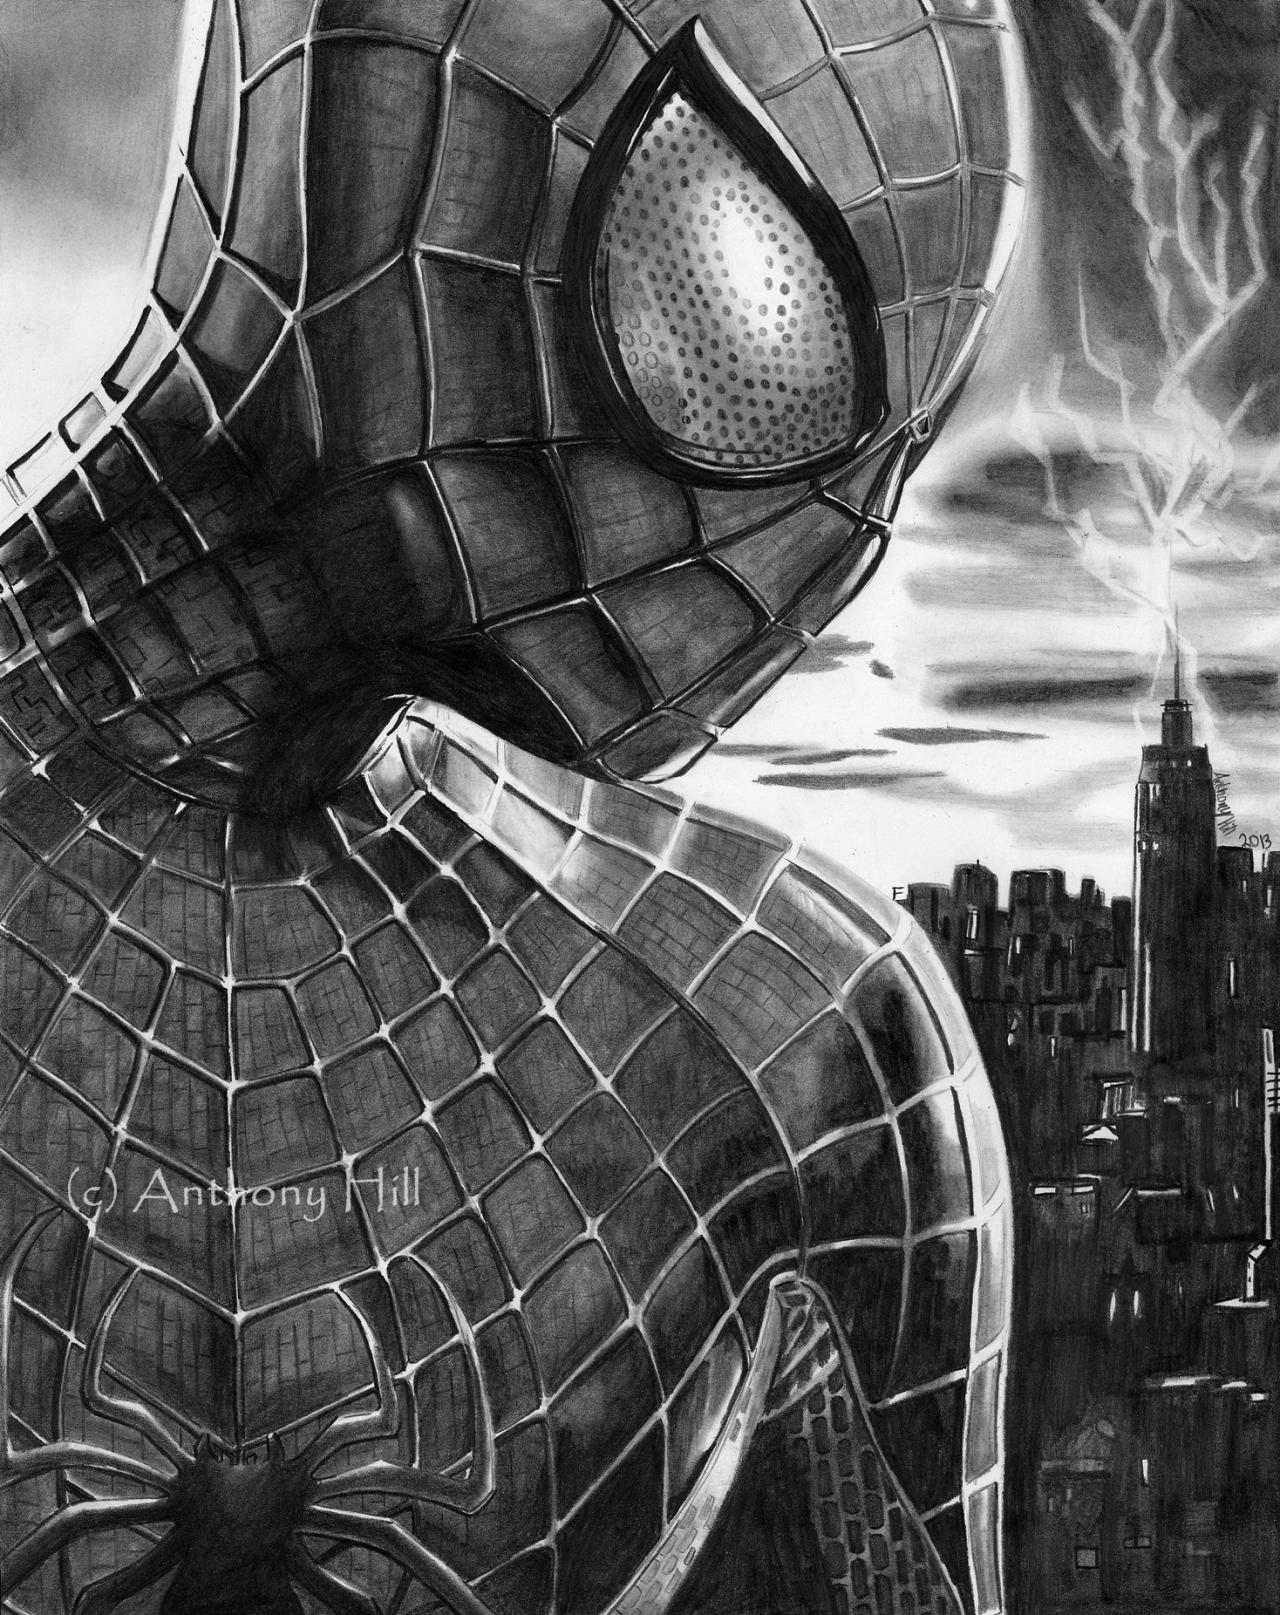 Drawn pencil spider Spider man Amazing Pencil Graphite